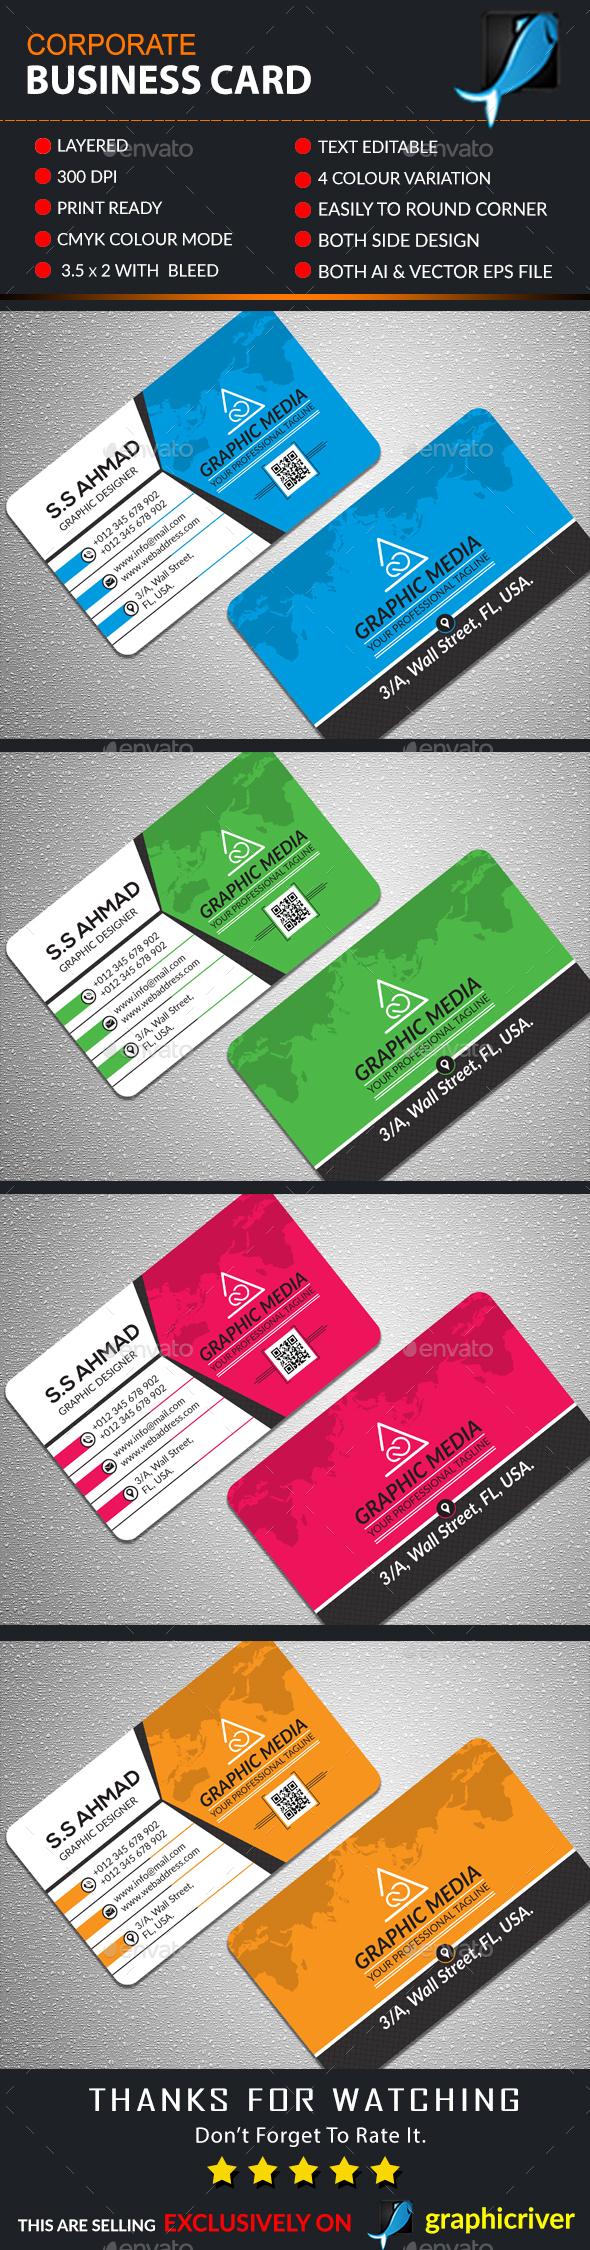 Corporate Business Card Corporate Business Card Printing Business Cards Business Card Inspiration